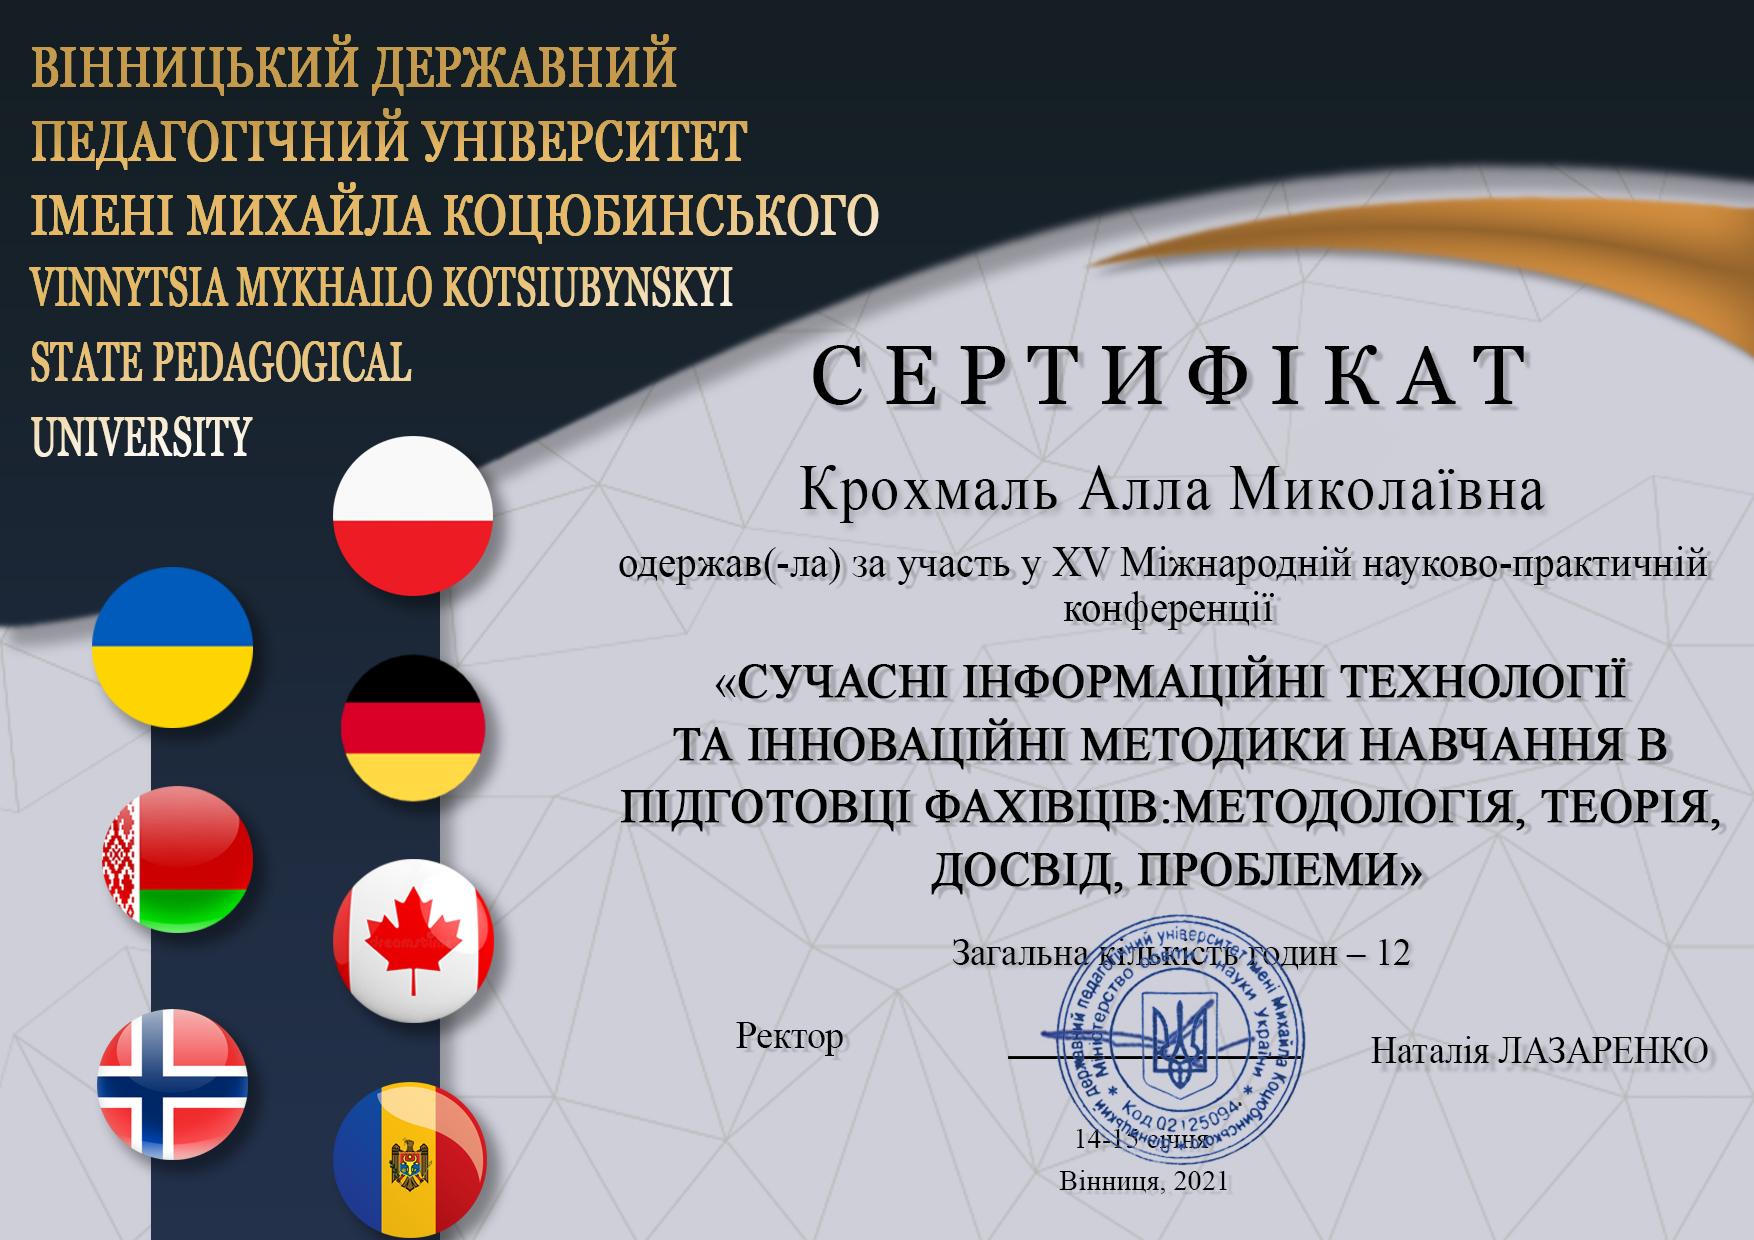 Крохмаль Алла Миколаївна